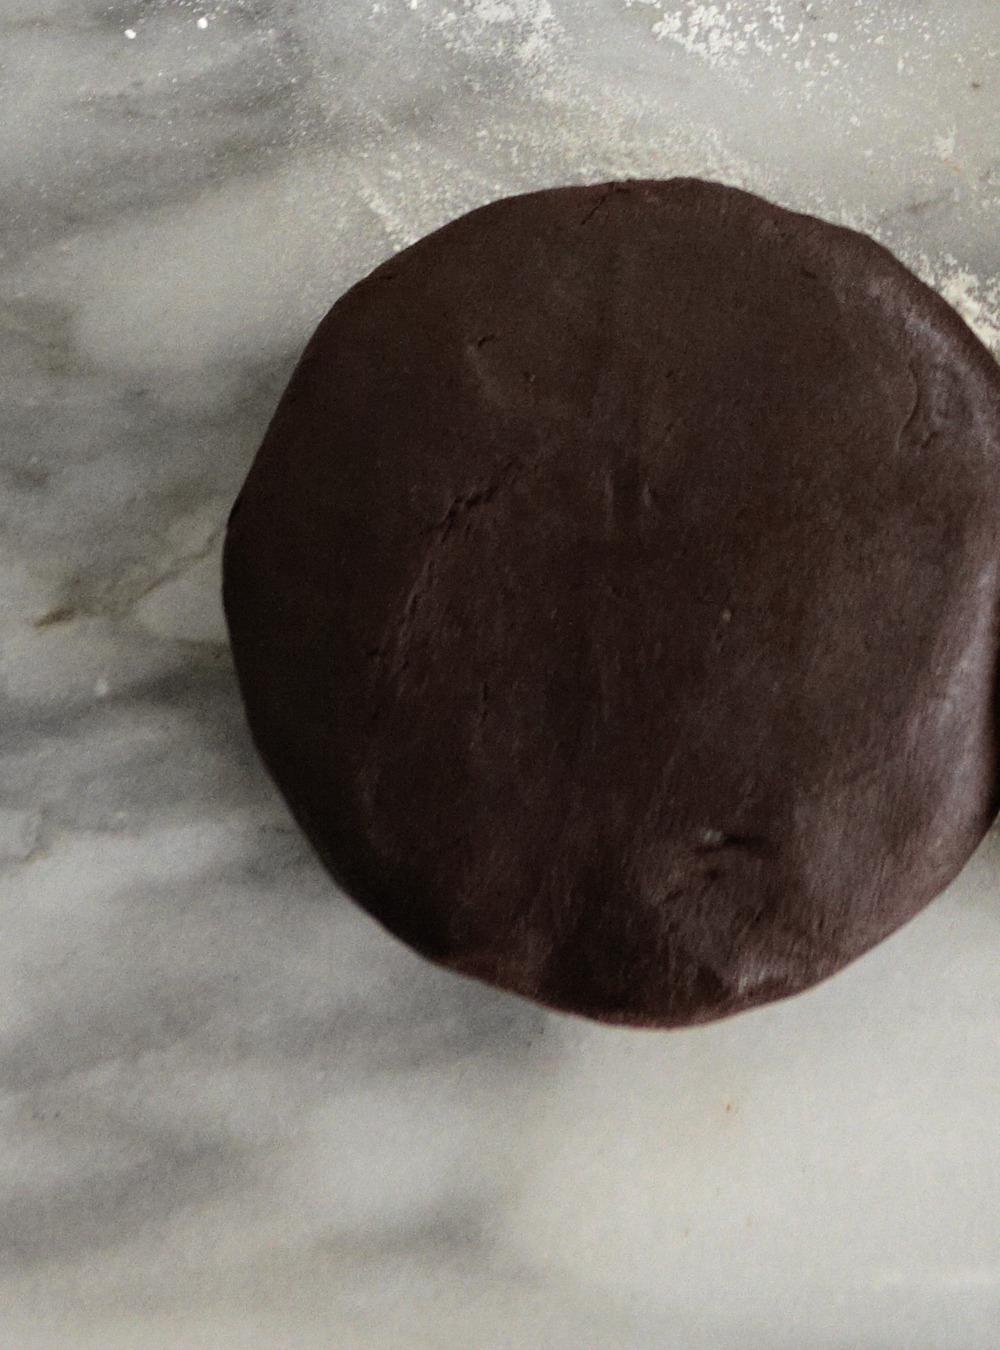 Biscuits au chocolat de base | ricardo